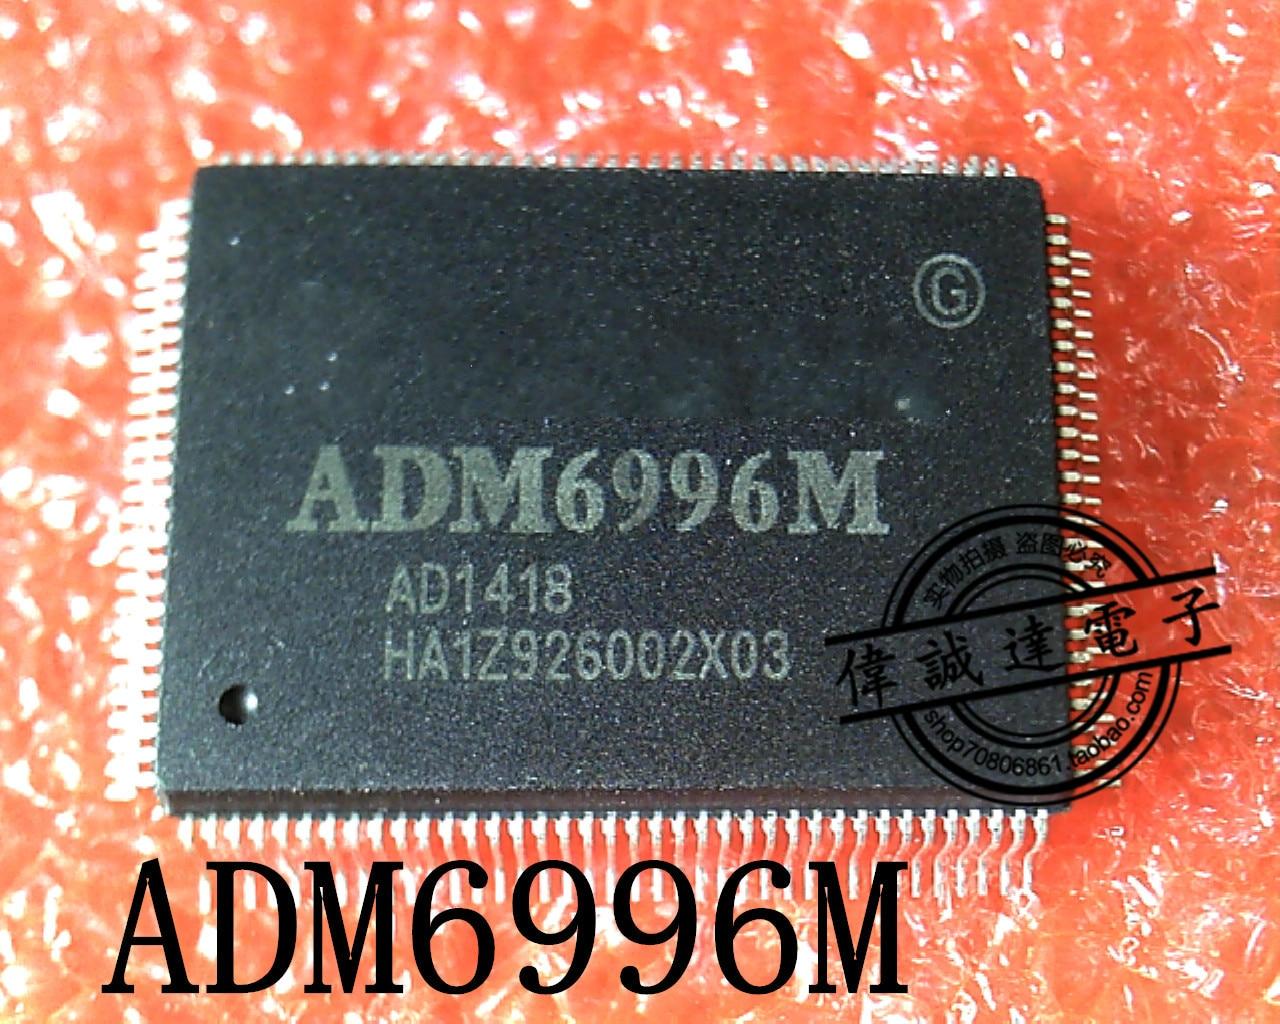 10 قطعة ADM6996M QFP128 جديد